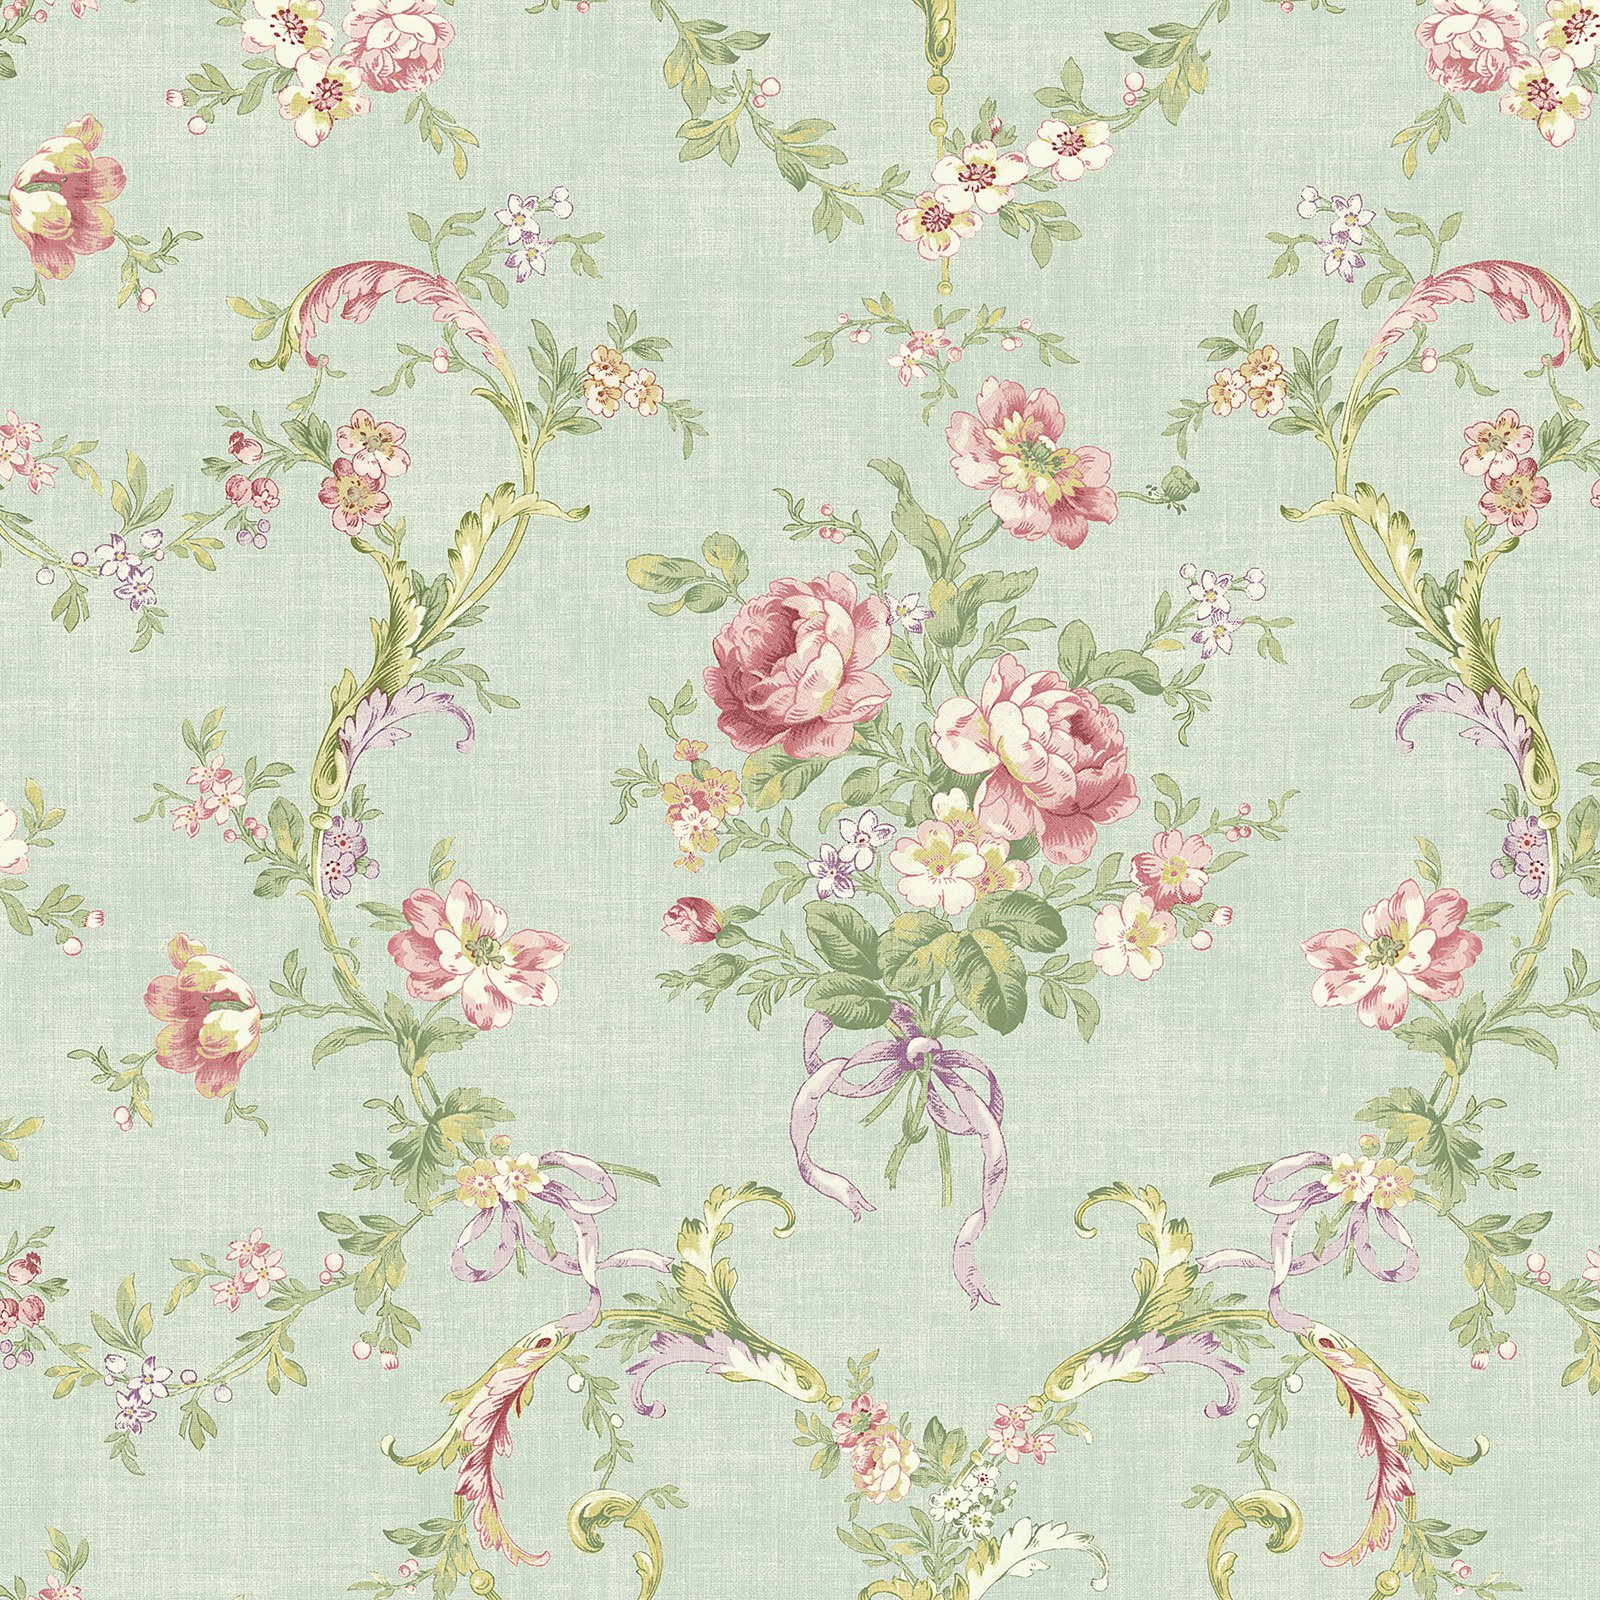 Fairwinds Studios Delicate Floral Bouquet Wallpaper Walmart Com